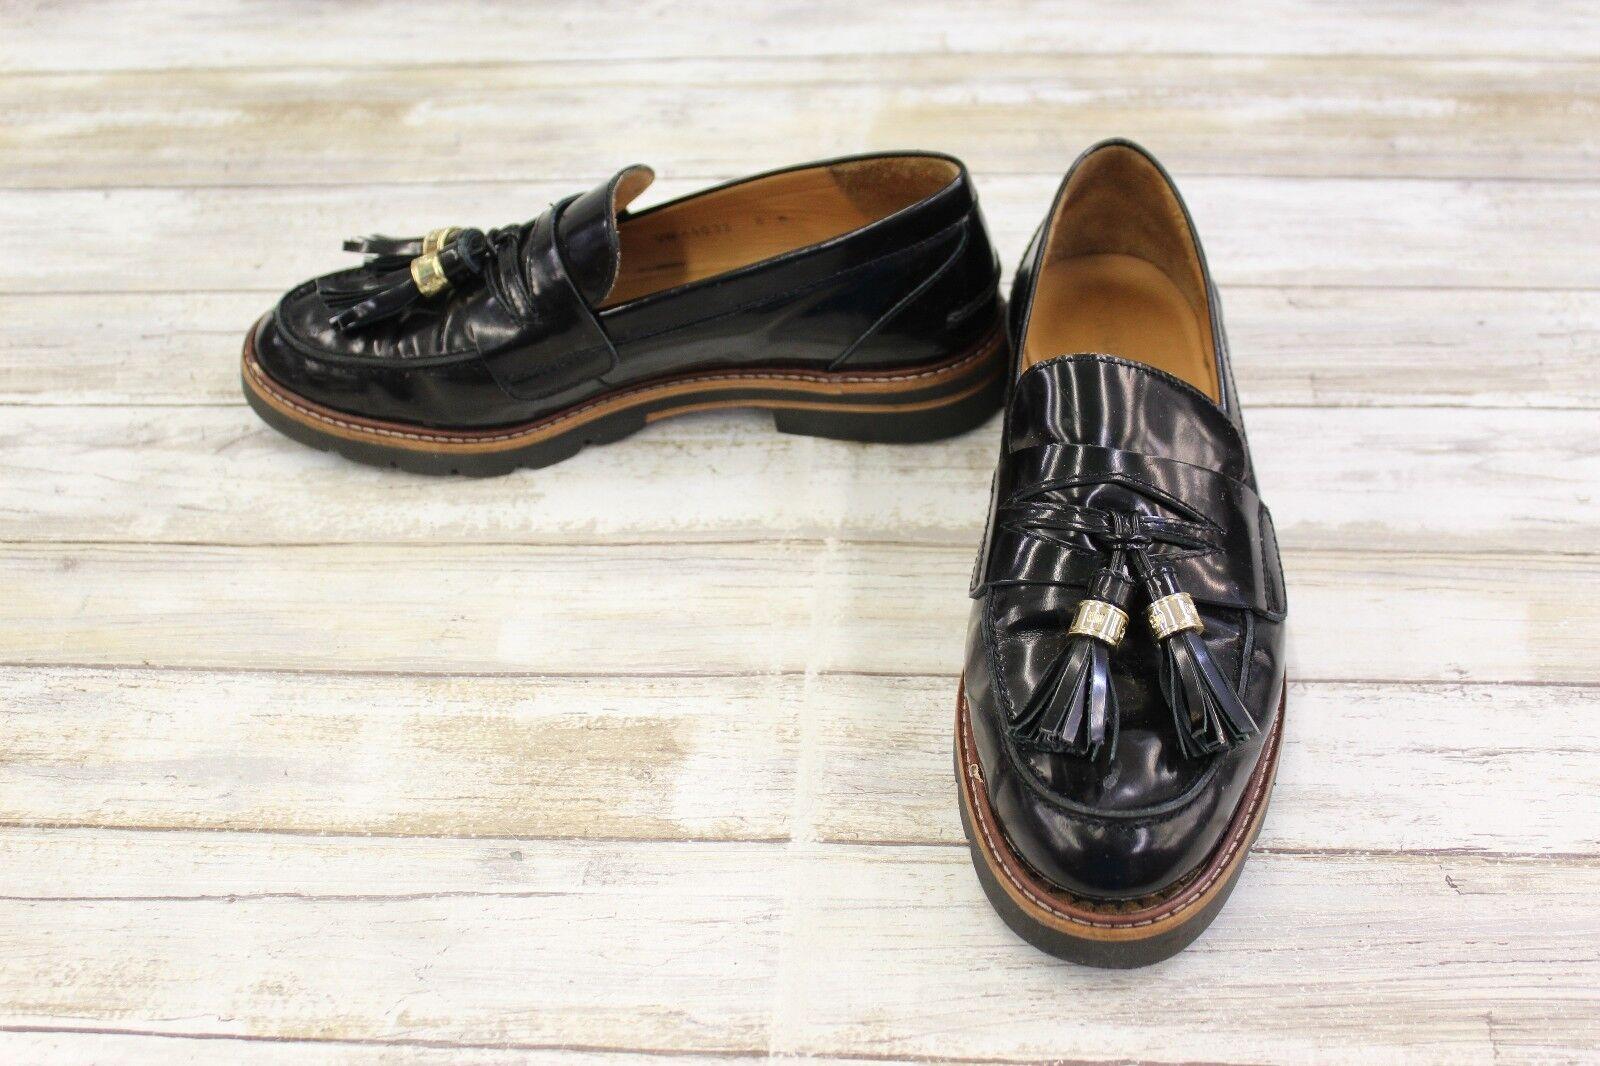 b611f34e847 Buy Stuart Weitzman Manila Polished Calf Leather Loafers Women s ...